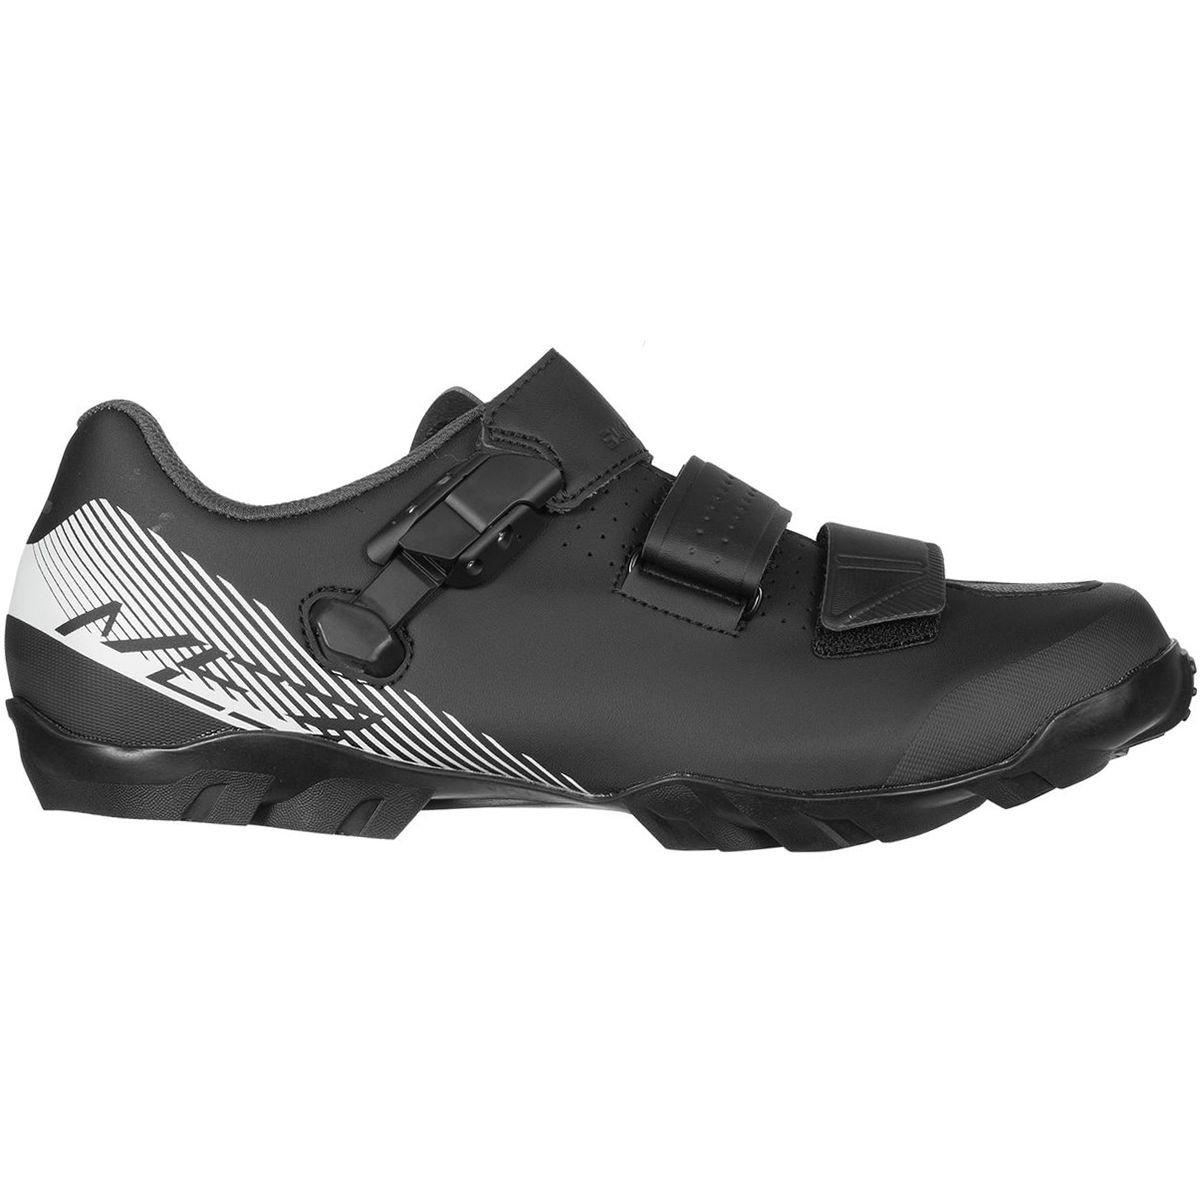 SHIMANO SH-ME3 Mountain Bike Shoe - Men's Black/White, 45.0